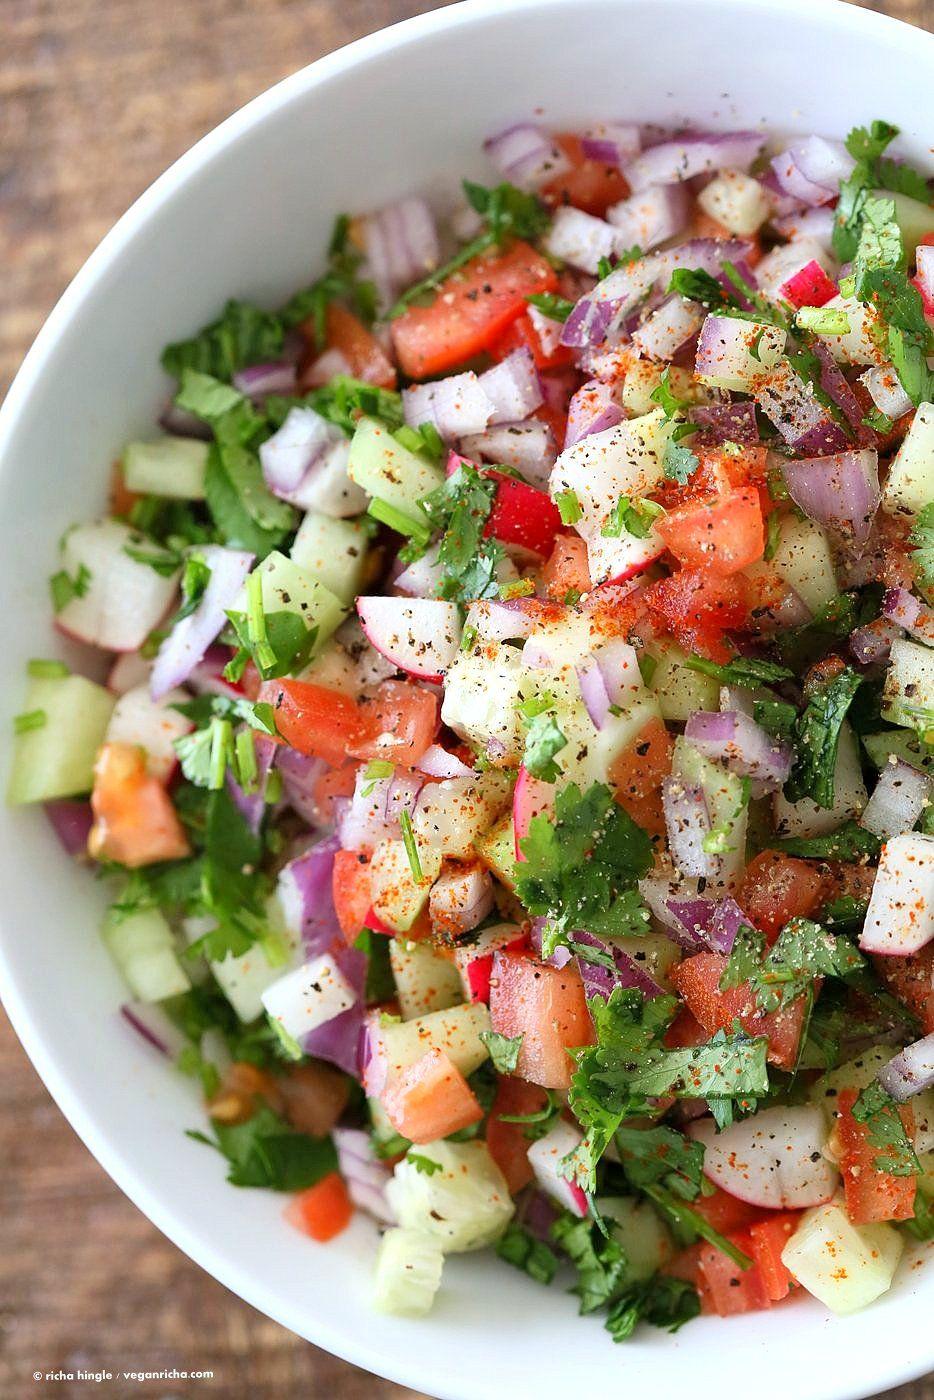 Kachumber Salad - Cucumber Tomato Onion Salad #indianfood